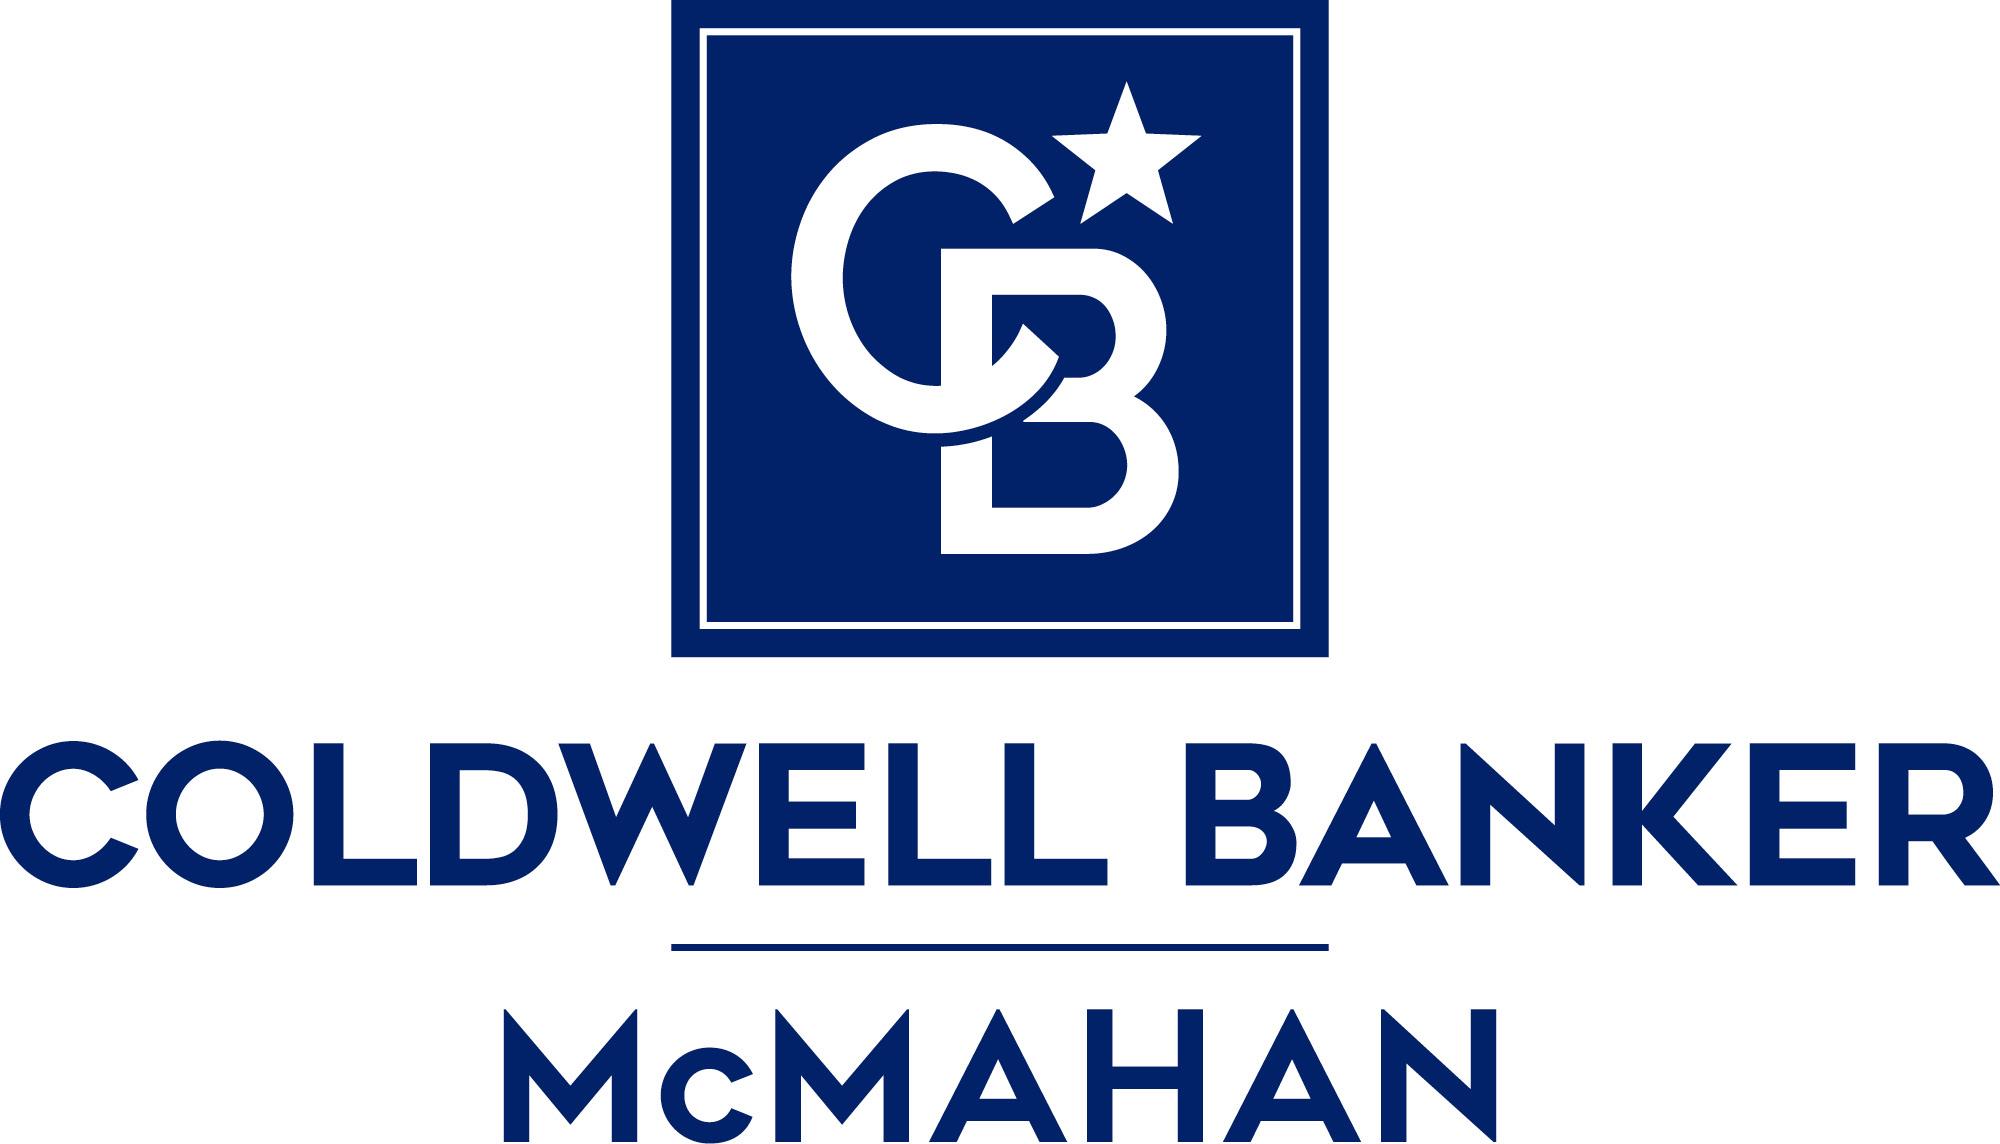 Barbara Moore - Coldwell Banker McMahan